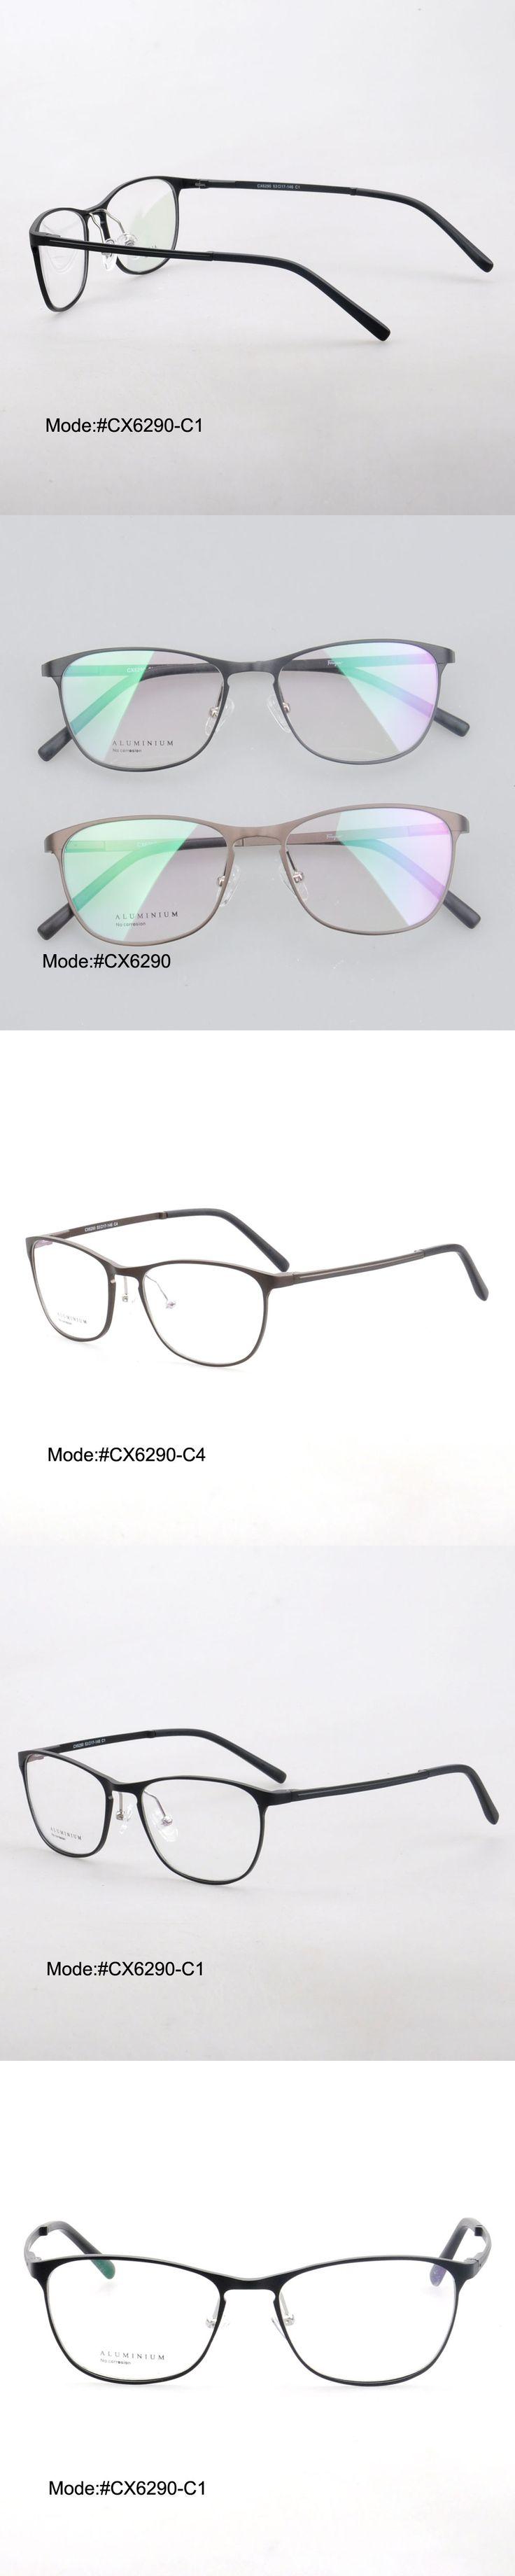 MY DOLI CX6290 fullrim alloy aluminium quality frame with spring hinge optical eyeglasses frame myopia RX spectacles eyewear